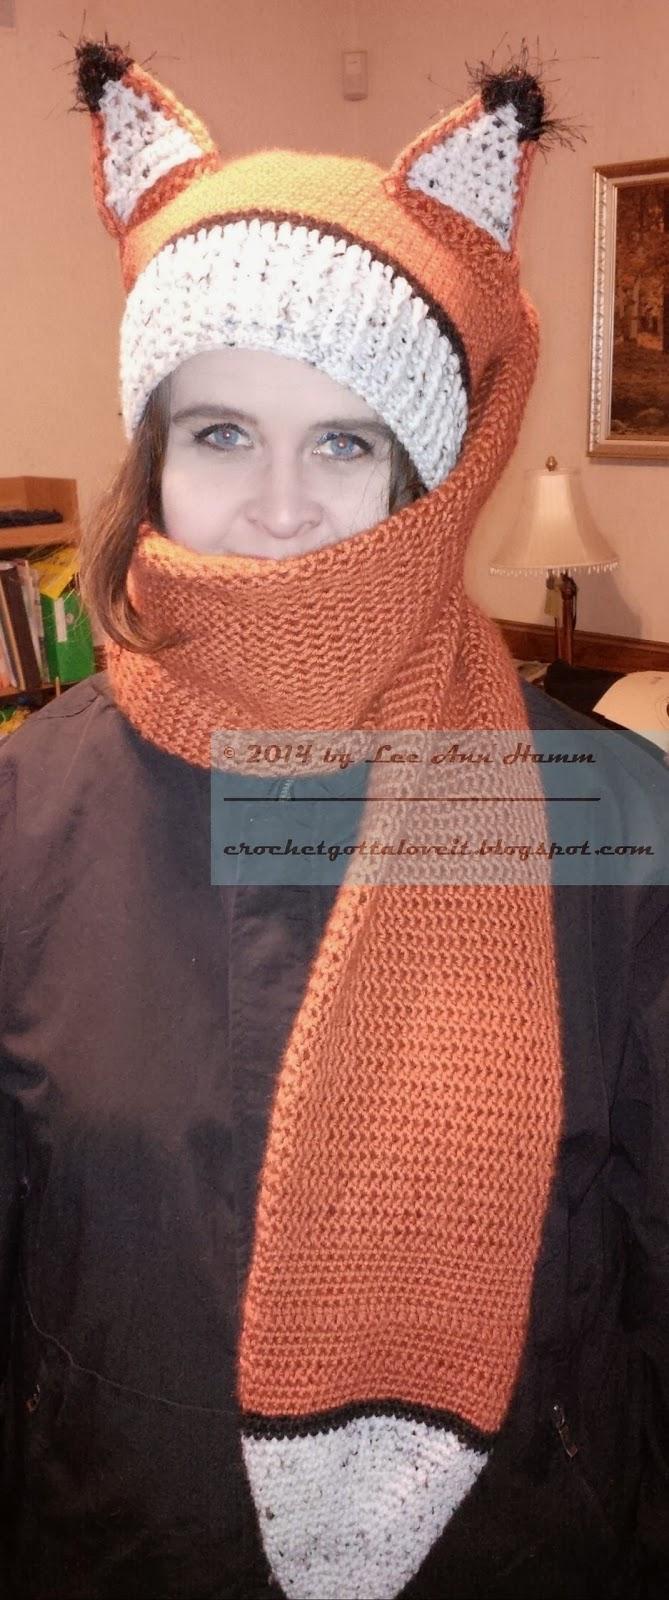 Crochet...Gotta Love It! Blog: Fox Scarf